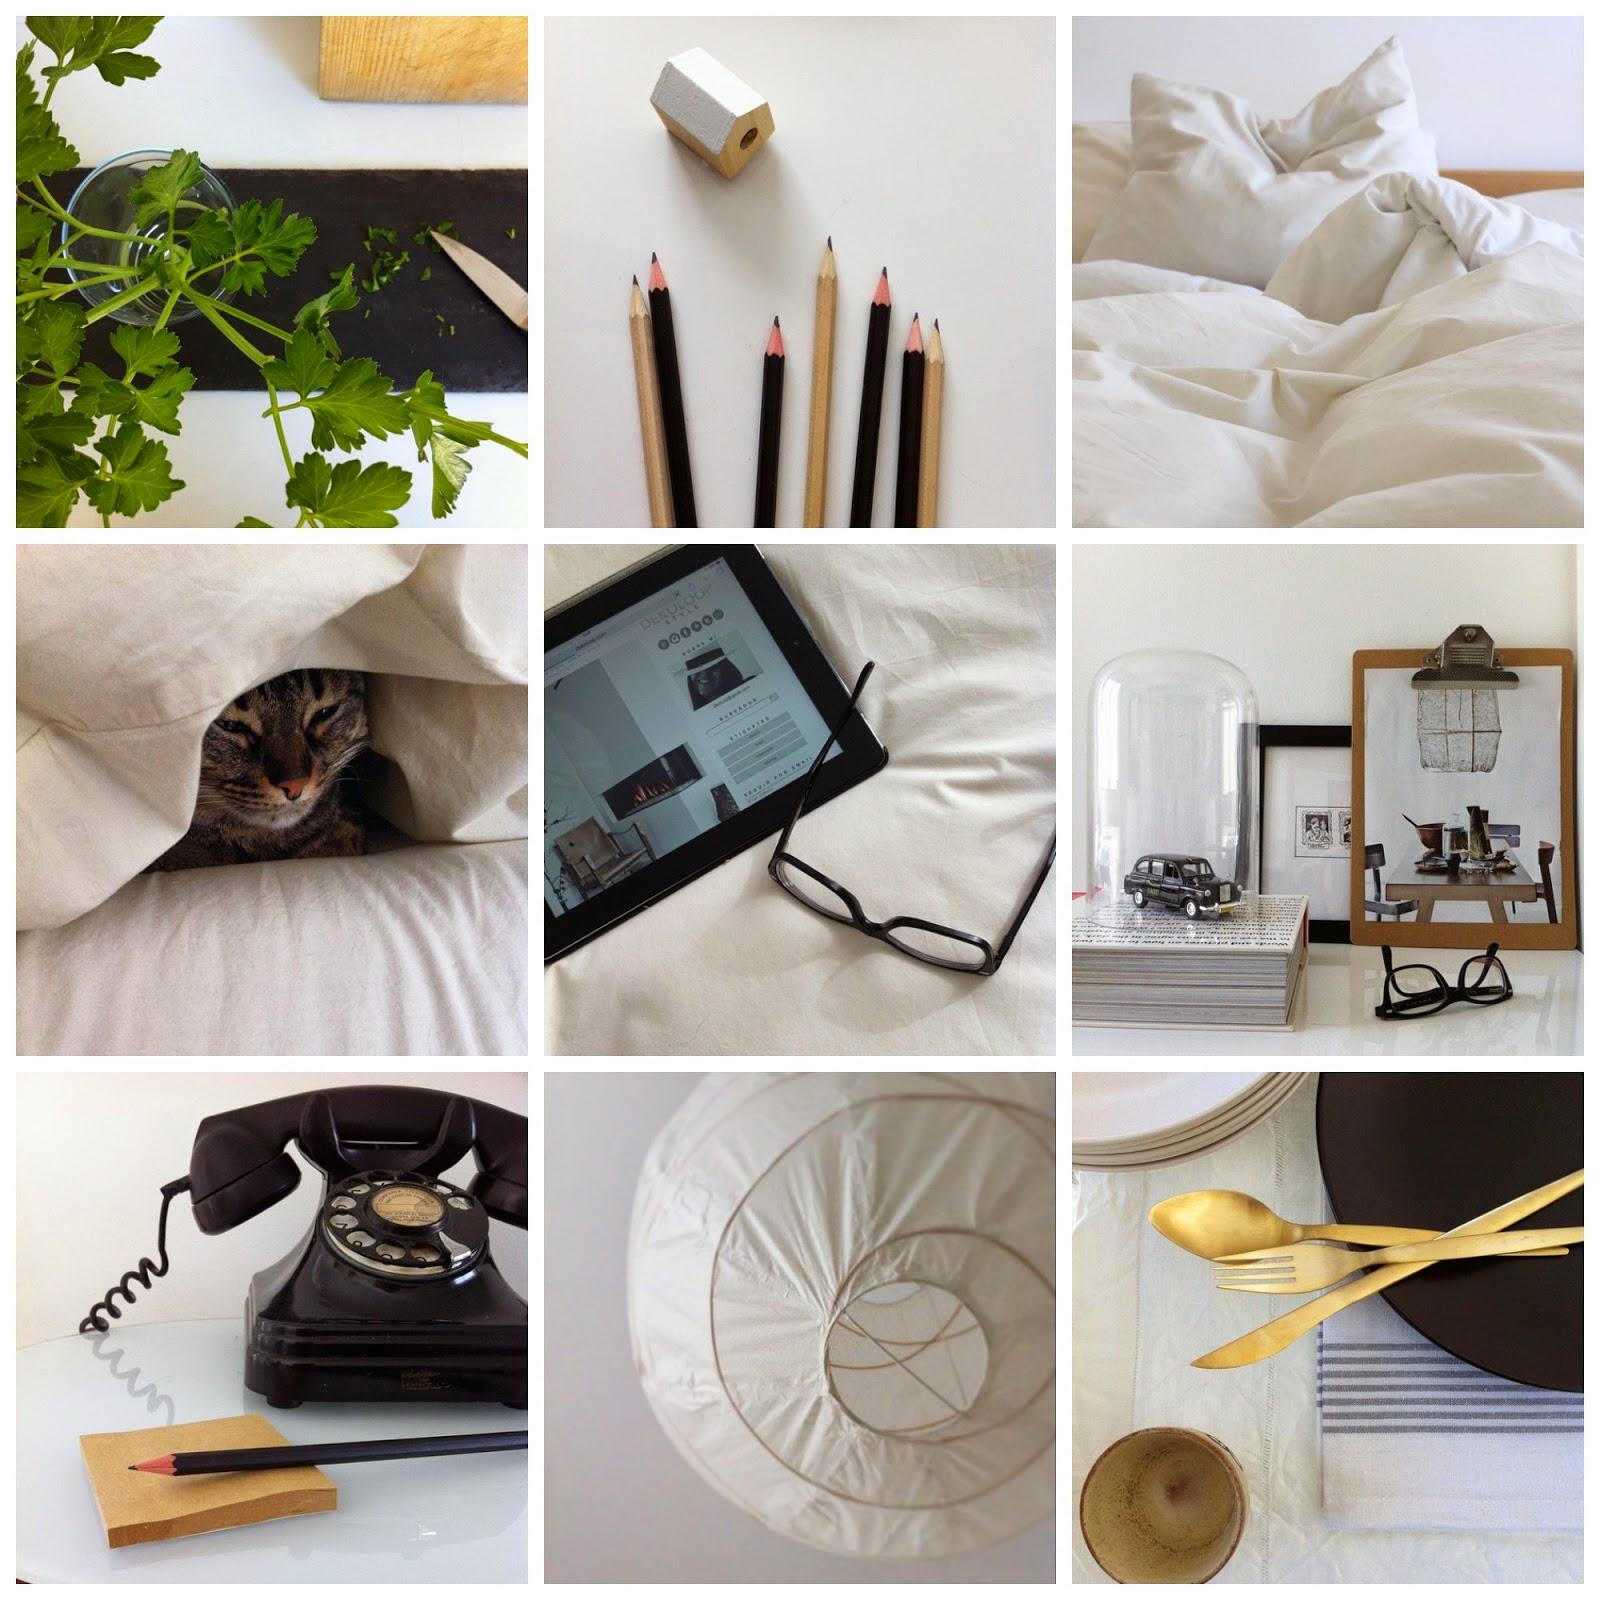 instagram, dekoloop, styling, estilismo, minimalista, blanco, negro, madera